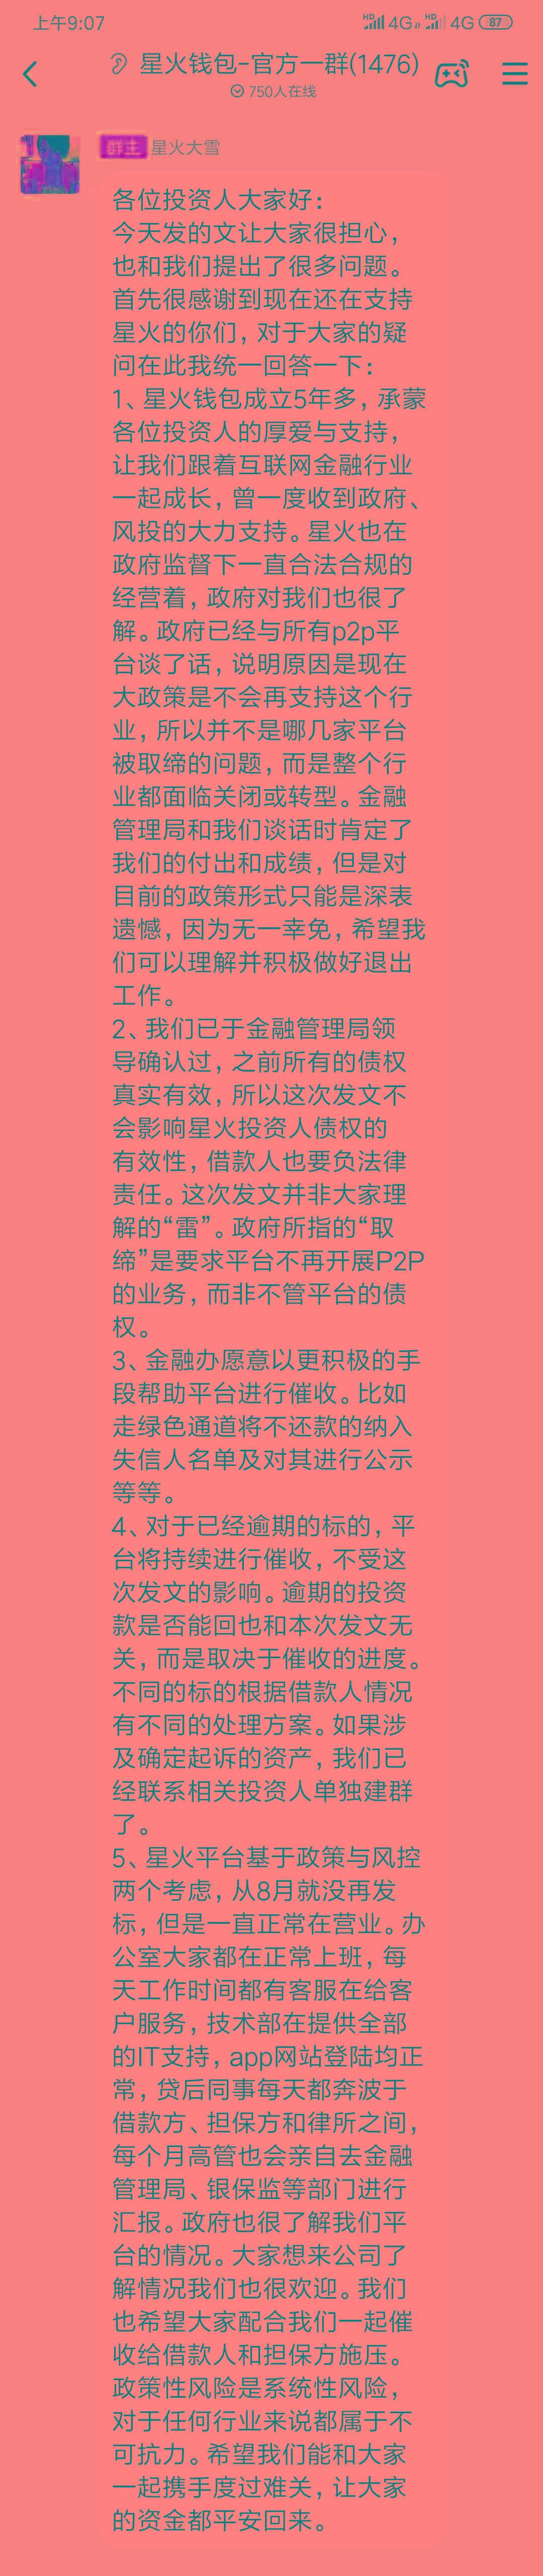 http://www.2ku8.net/dushuxuexi/69851.html